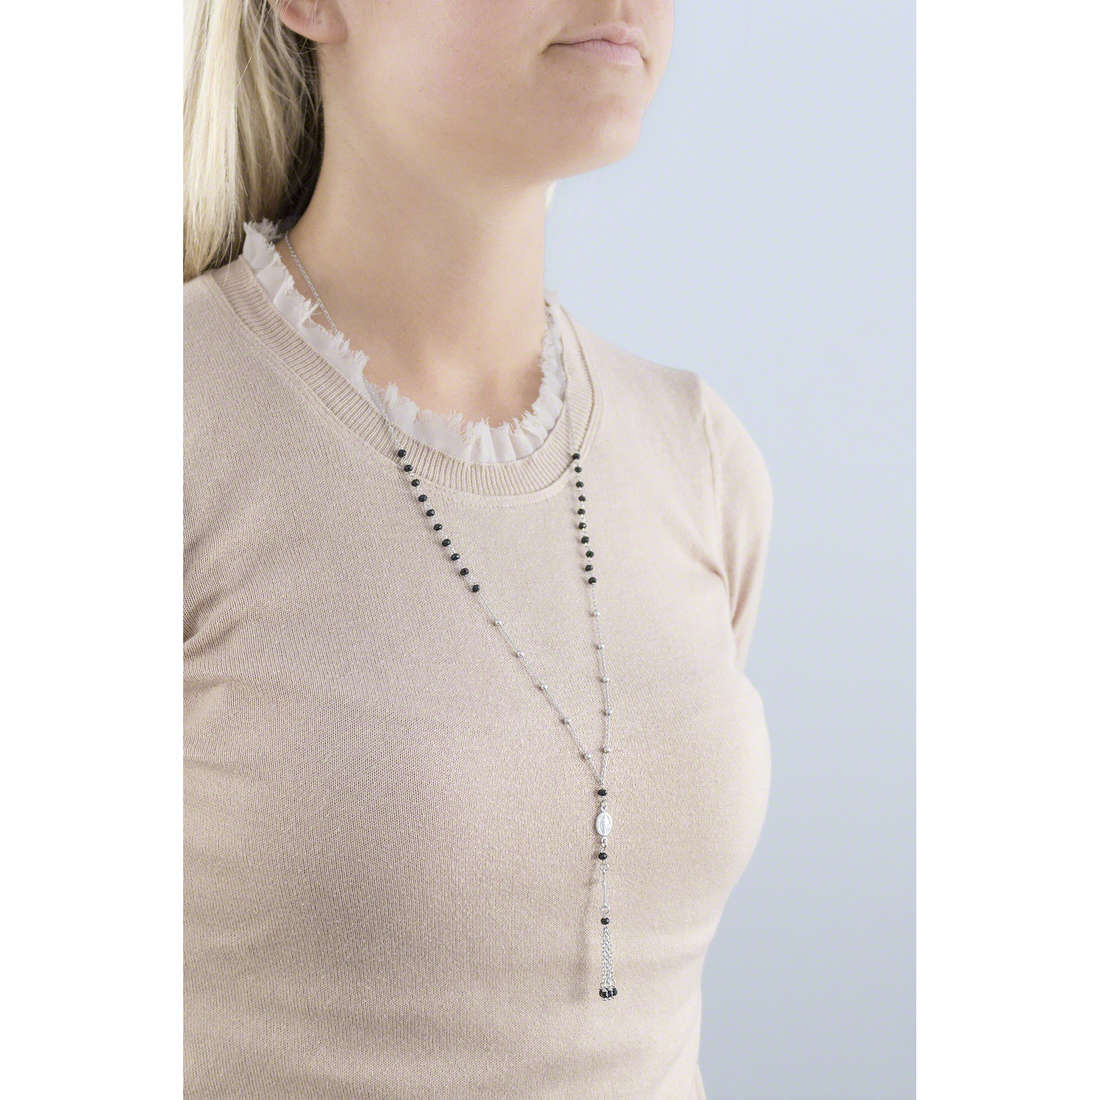 Amen necklaces woman CIUFFN indosso